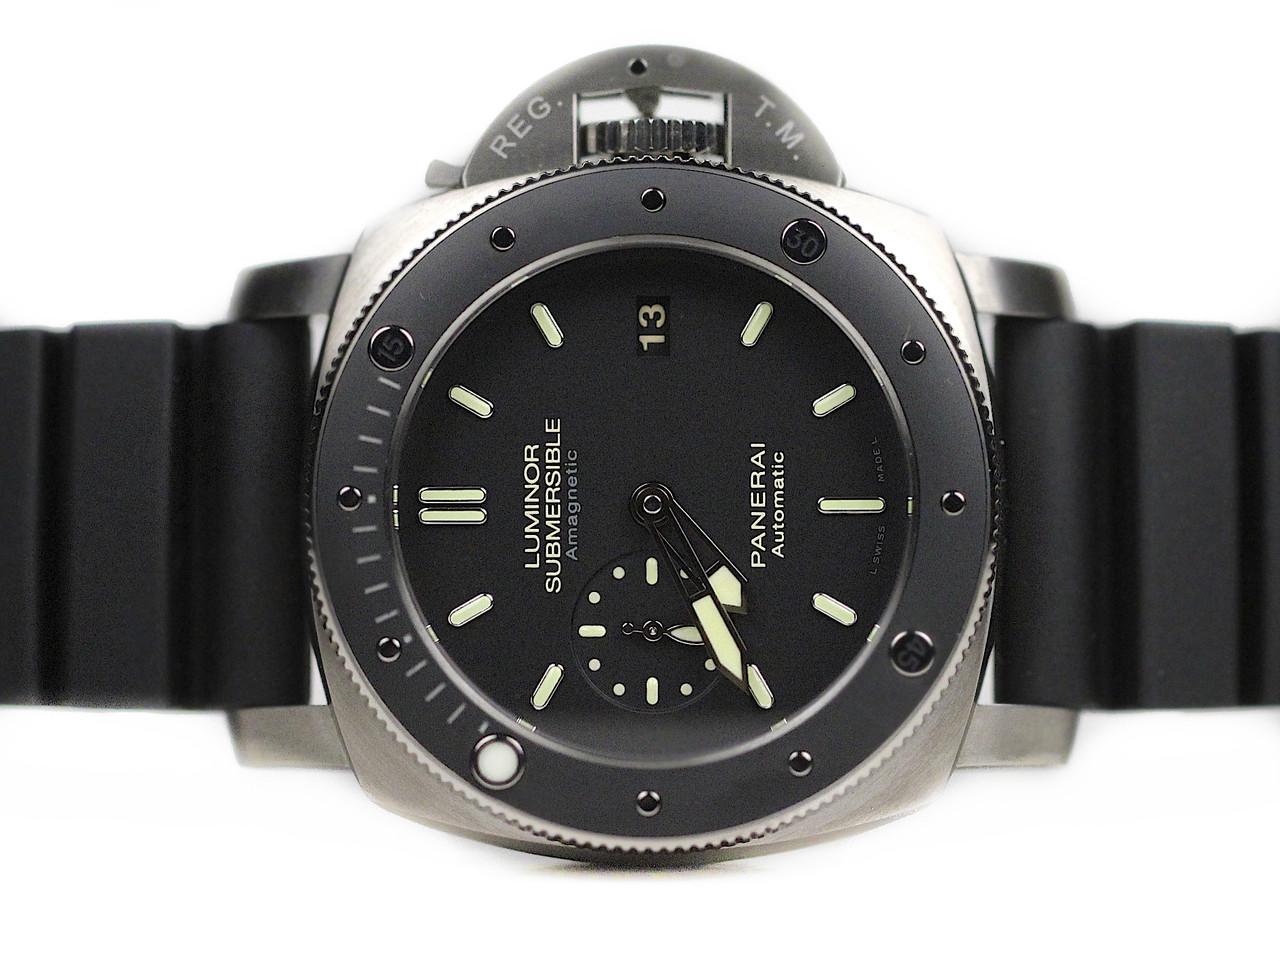 c3a033c84e2c Officine Panerai Wristwatch Luminor Submersible1950 Amagnetic 3 Days  Automatic Titanium Ref PAM00389 -- www.legendoftime.com